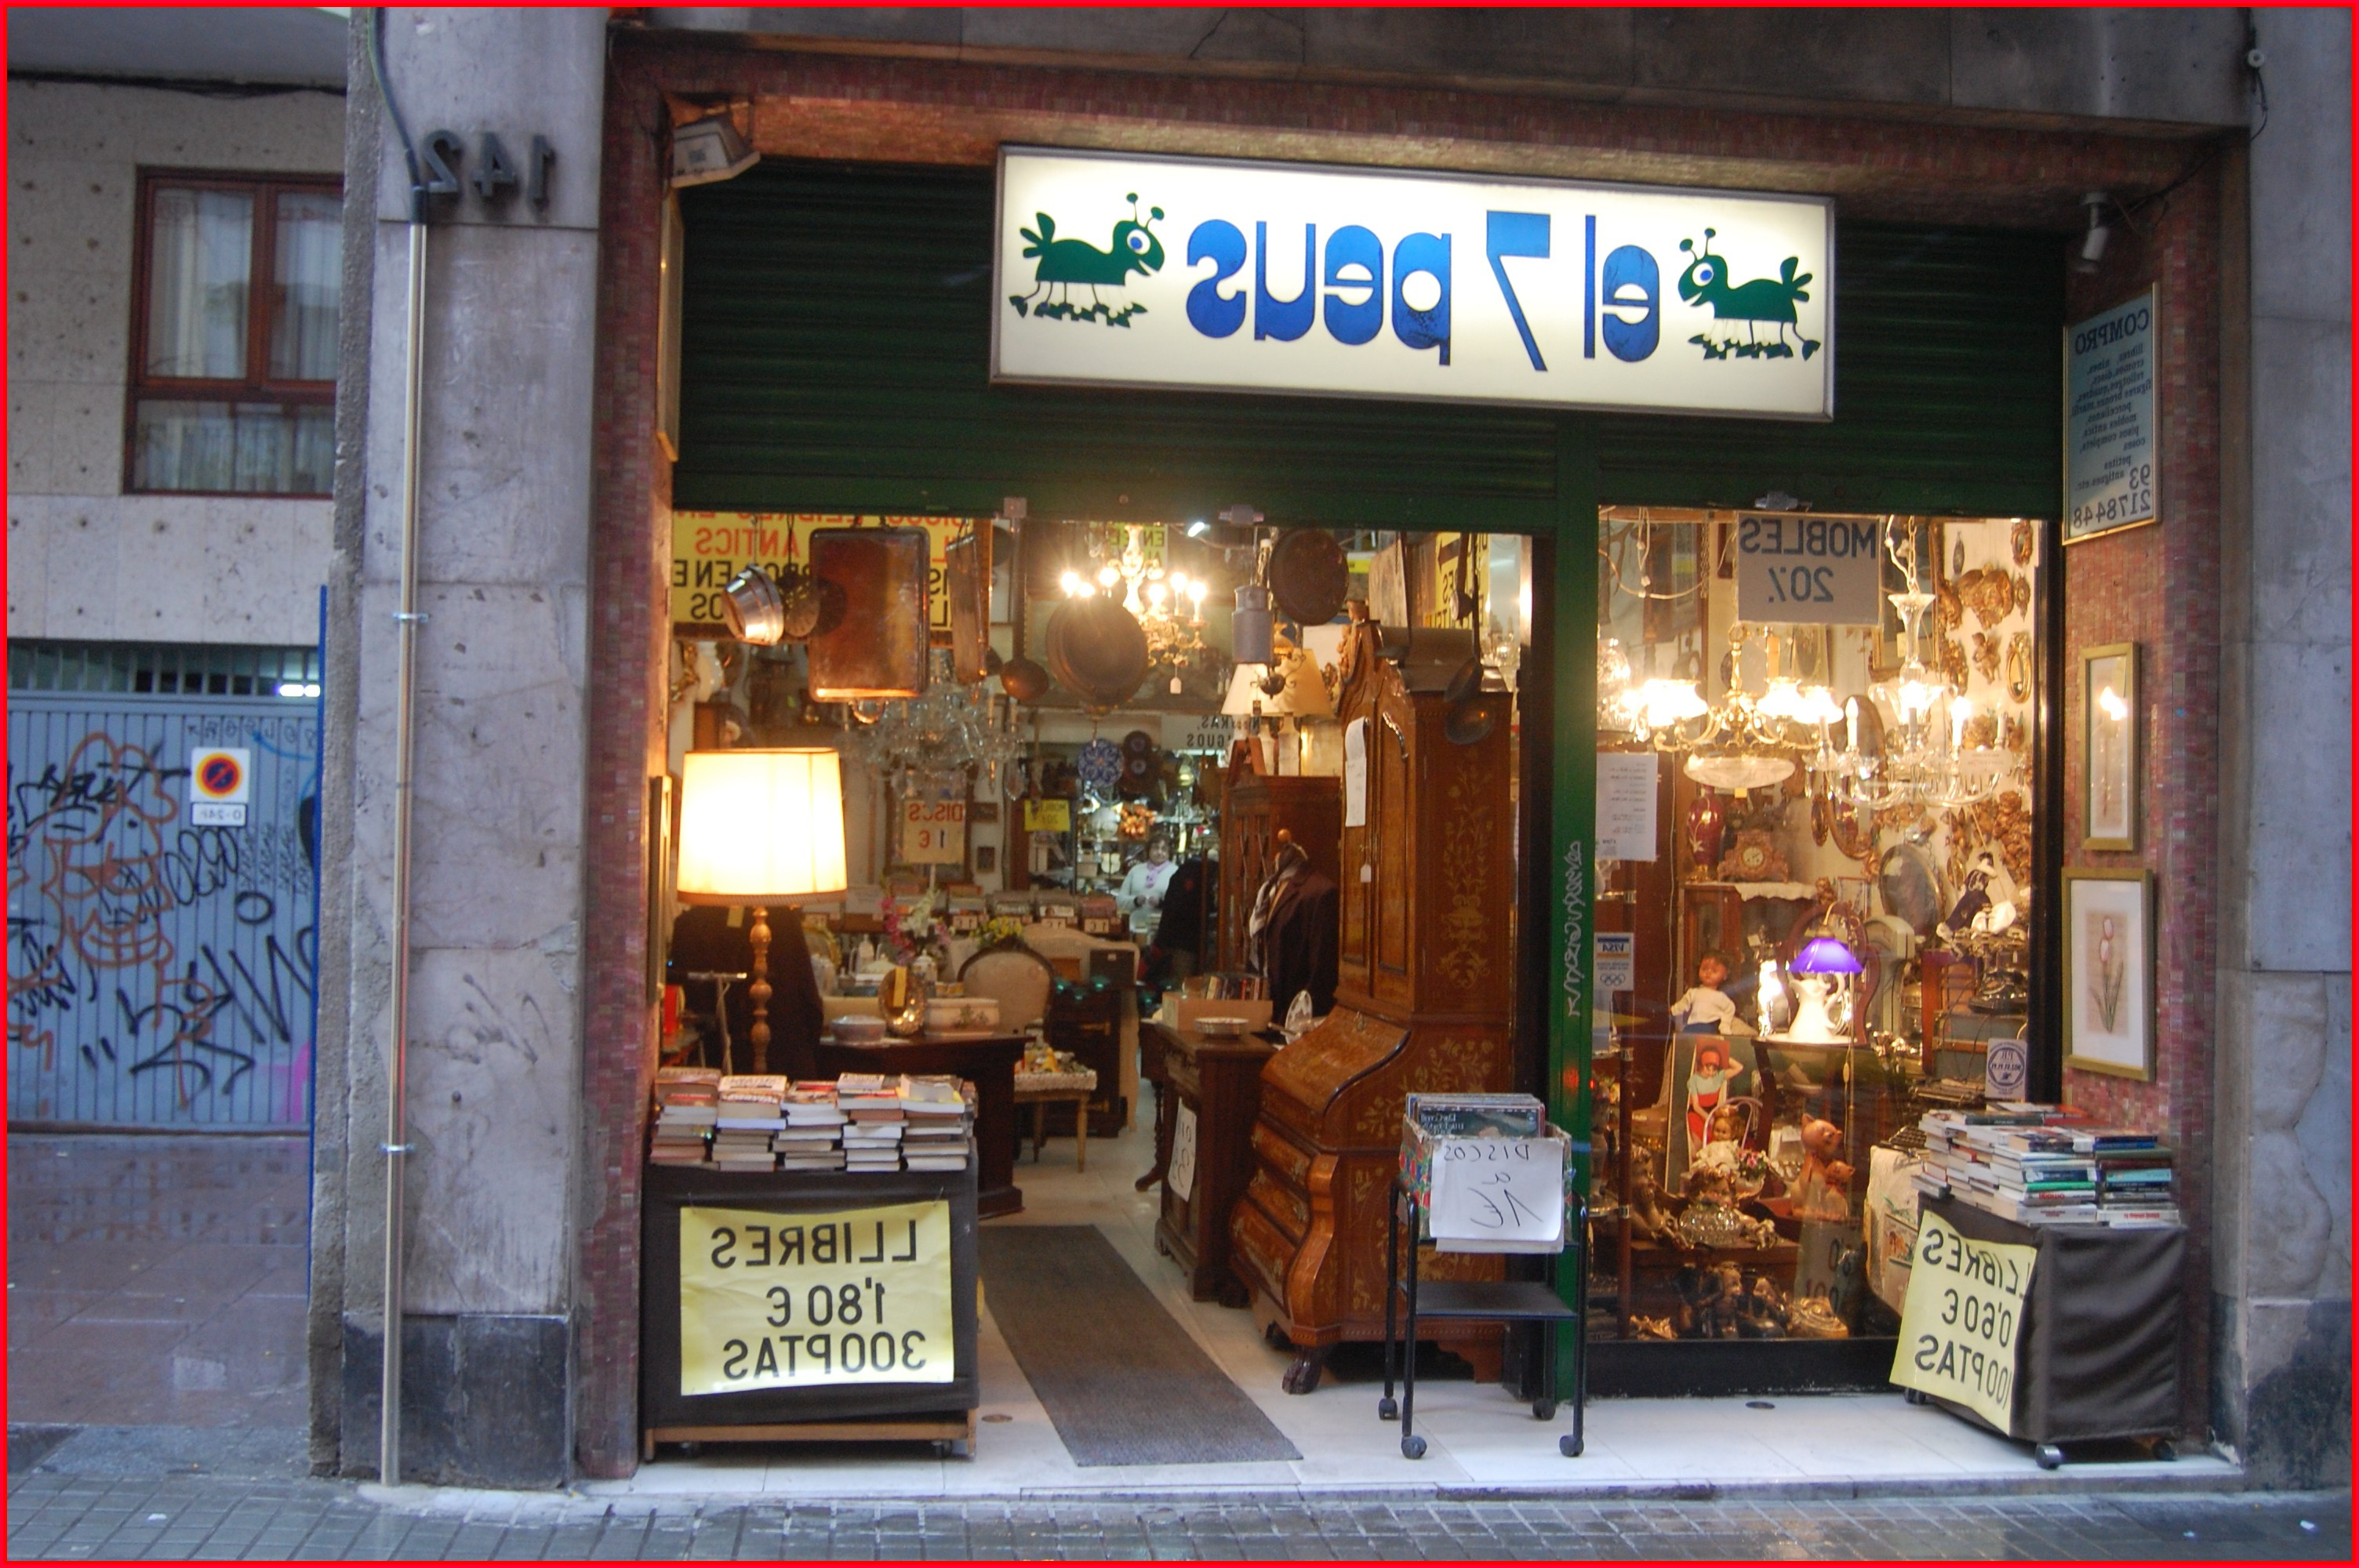 Tiendas De Muebles De Segunda Mano O2d5 Inspirador Tiendas De Muebles De Segunda Mano En Barcelona Galerà A